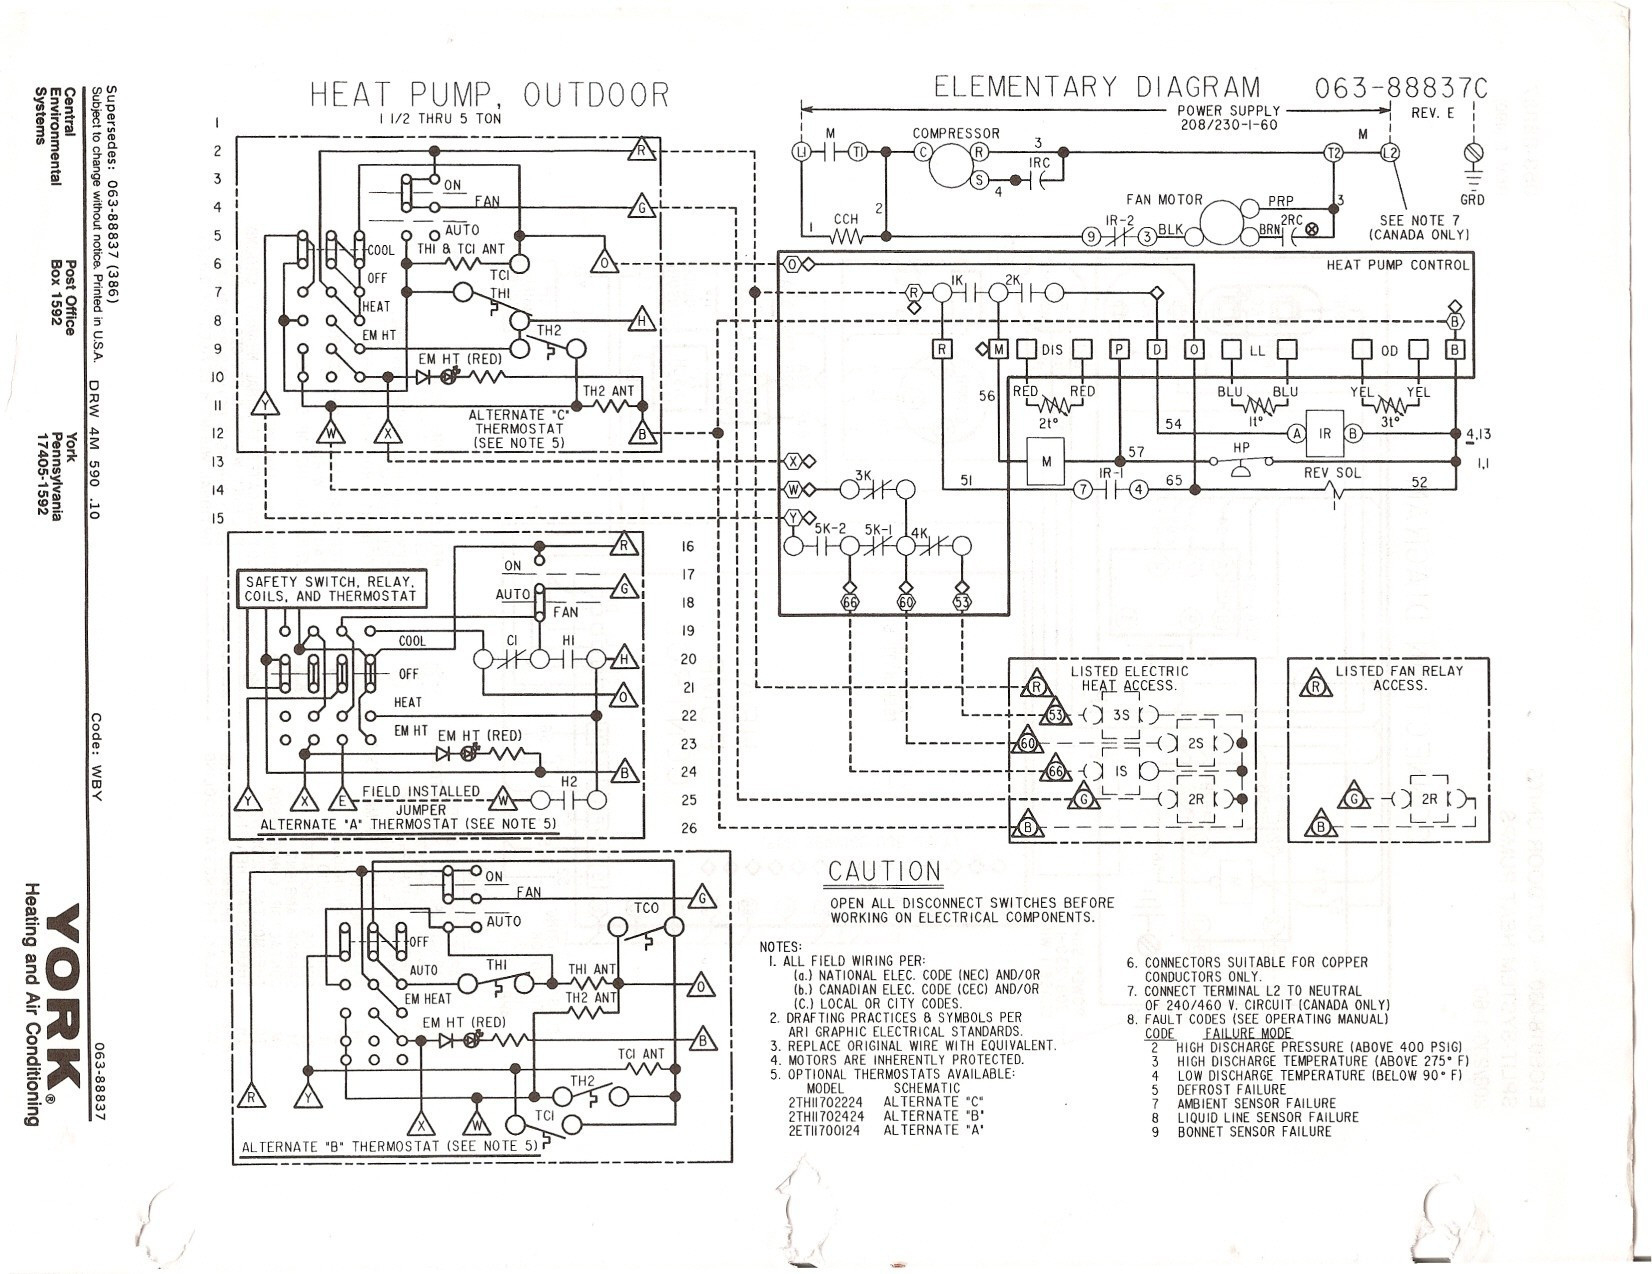 Goodman Heat Pump Thermostat Wiring Diagram New Generous York Air - Goodman Heat Pump Wiring Diagram